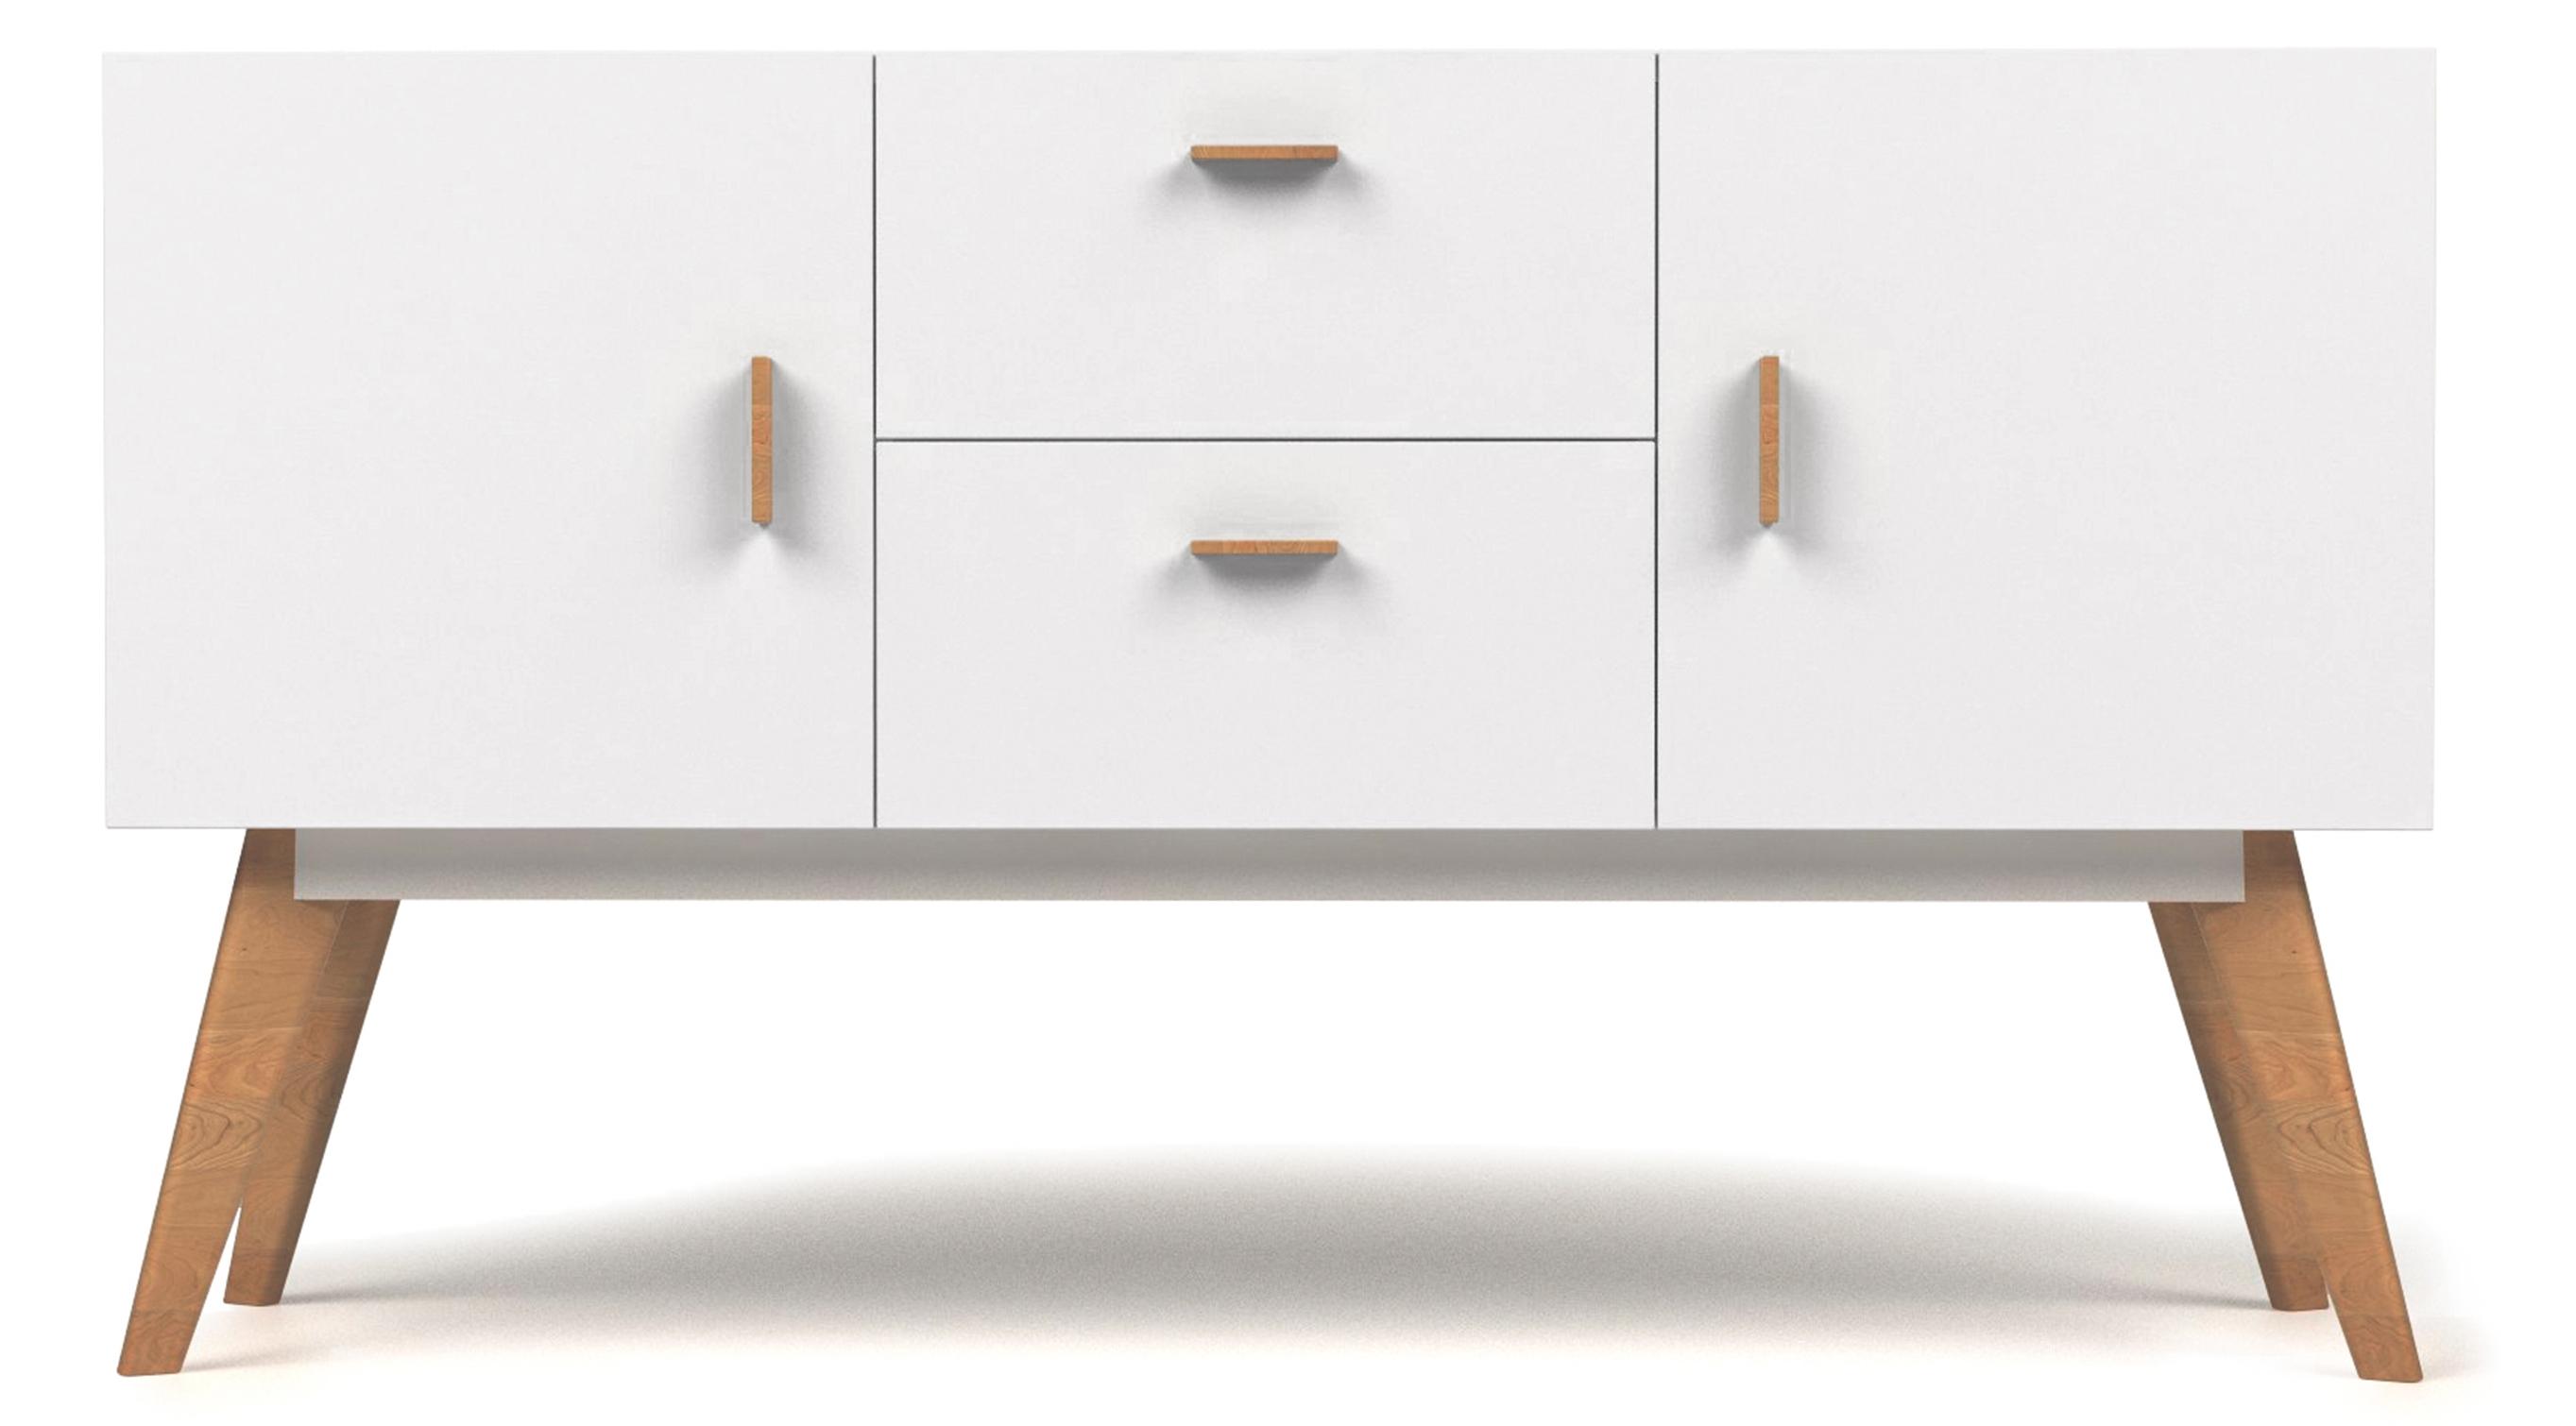 Buffet bois blanc 2 portes 2 tiroirs scandinave - Buffet bois blanc vieilli ...